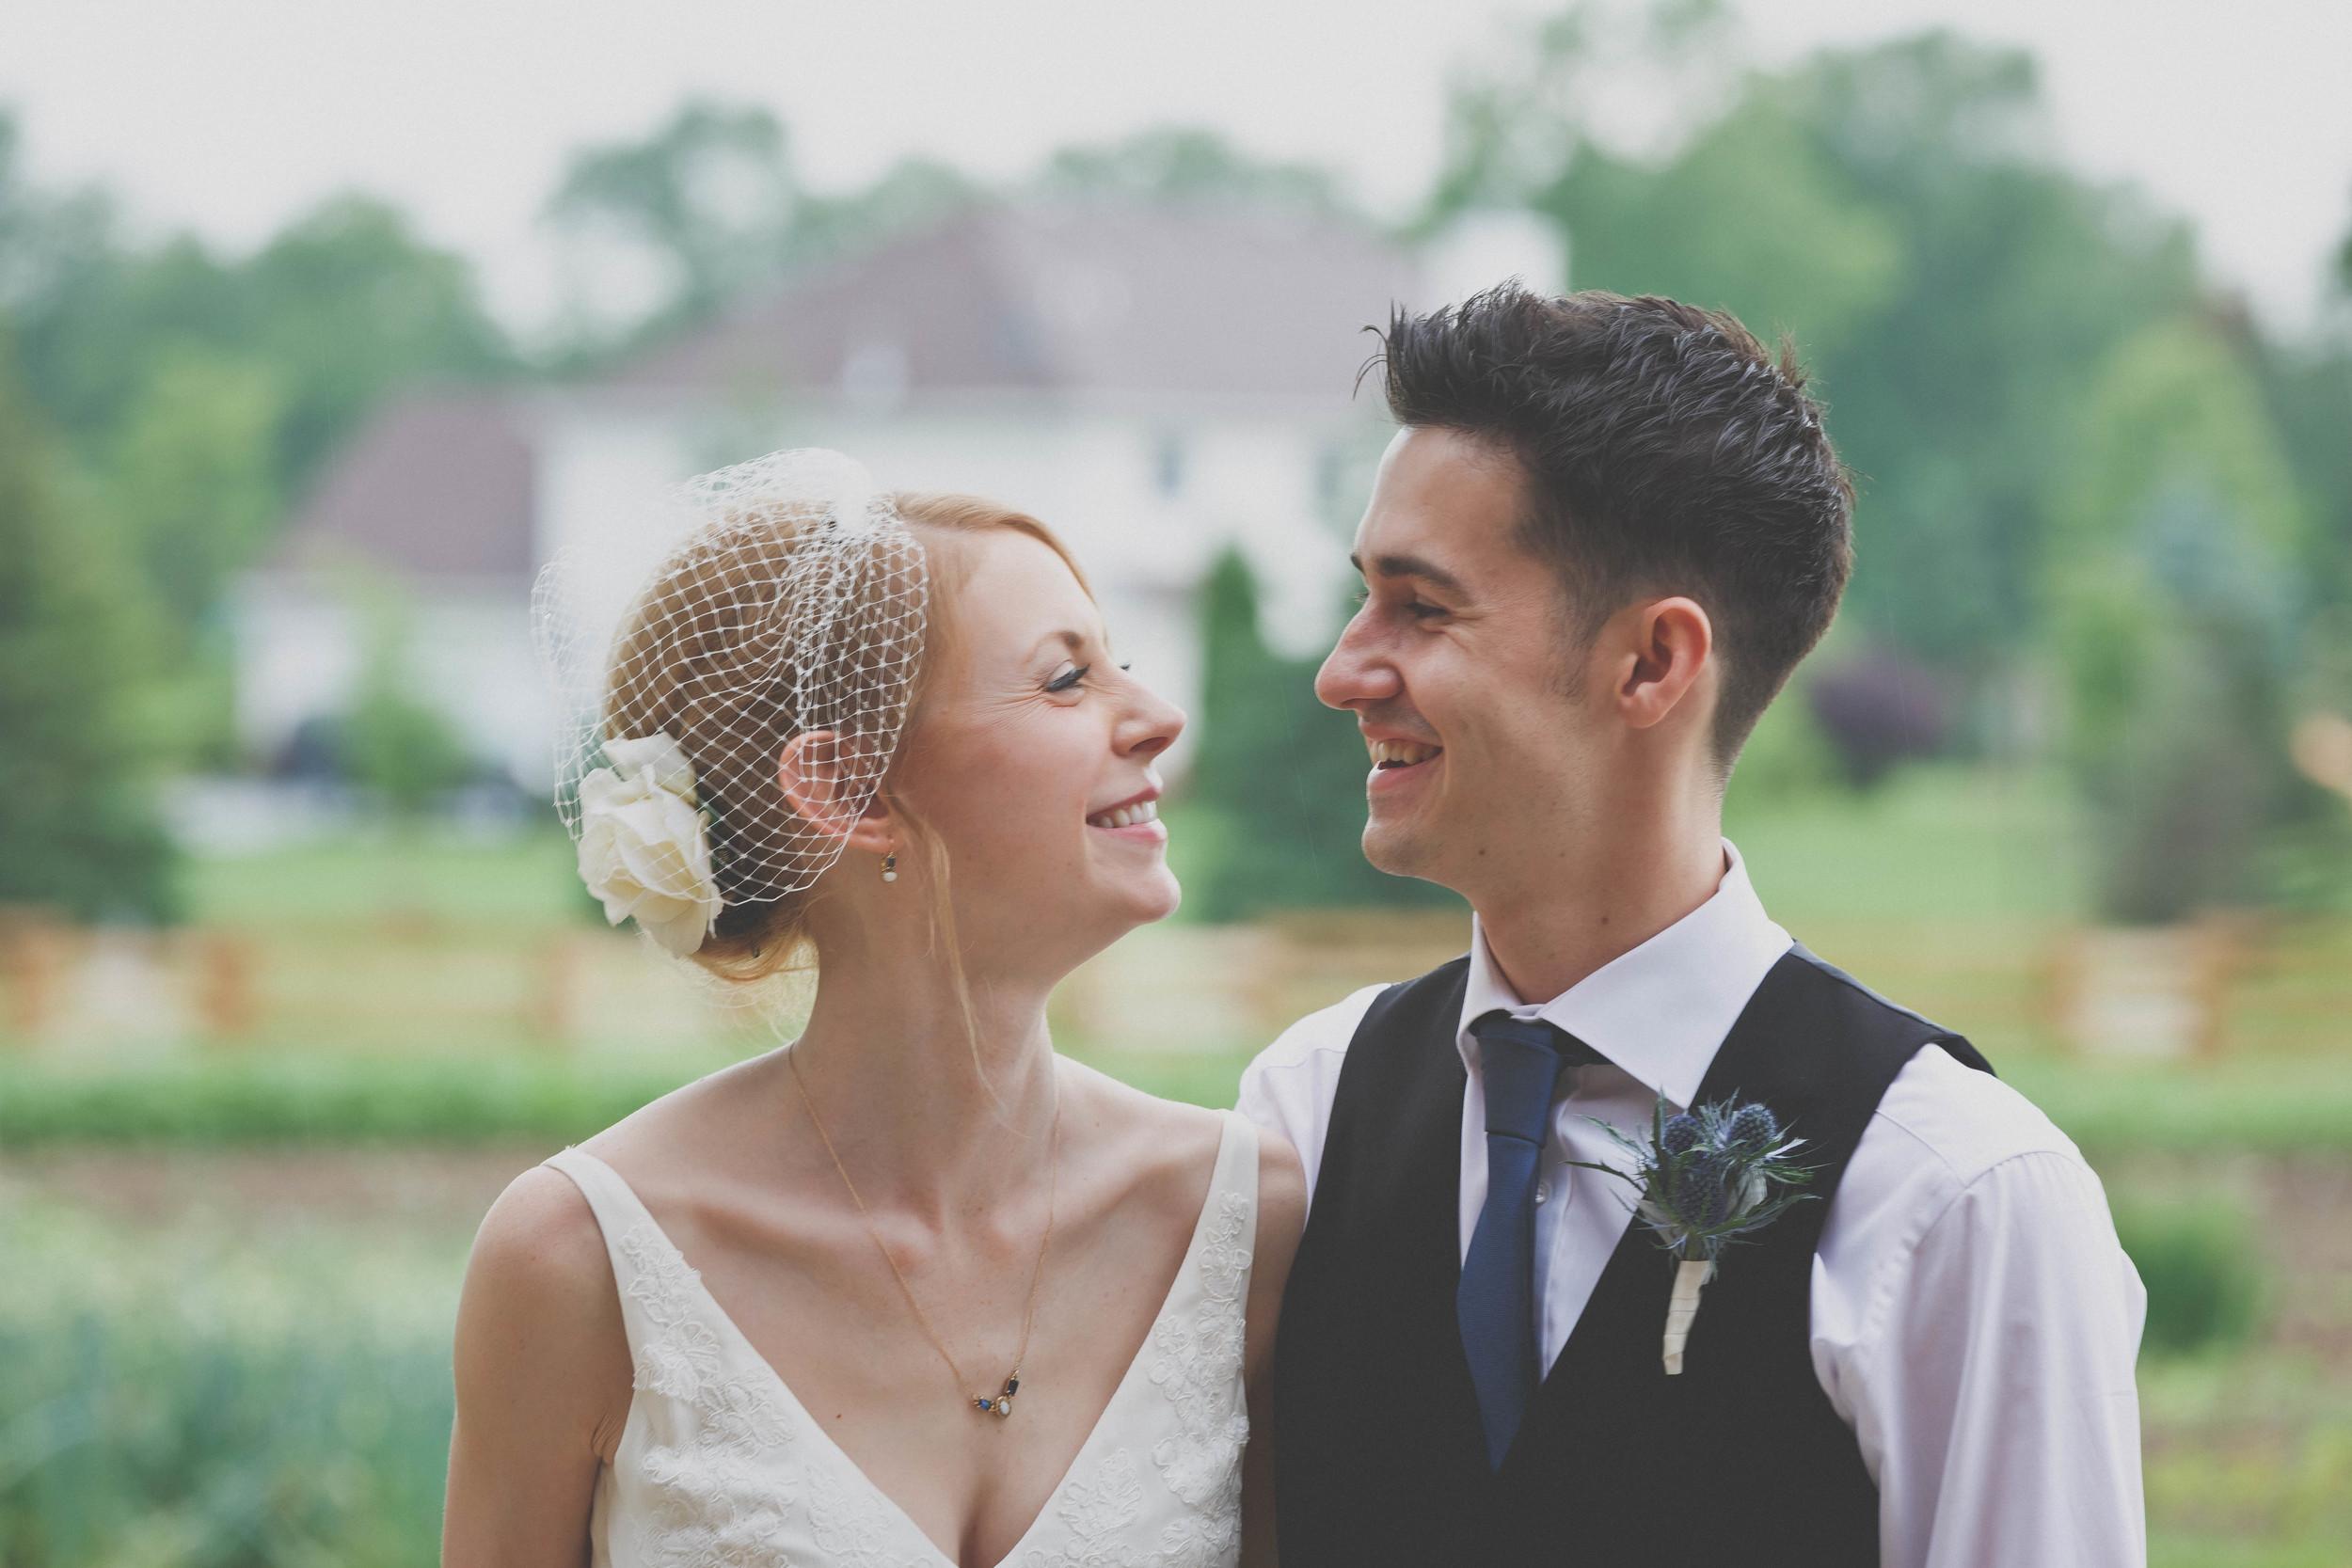 Zingerman's Cornman Farm Intimate Wedding - Marlo and Allan